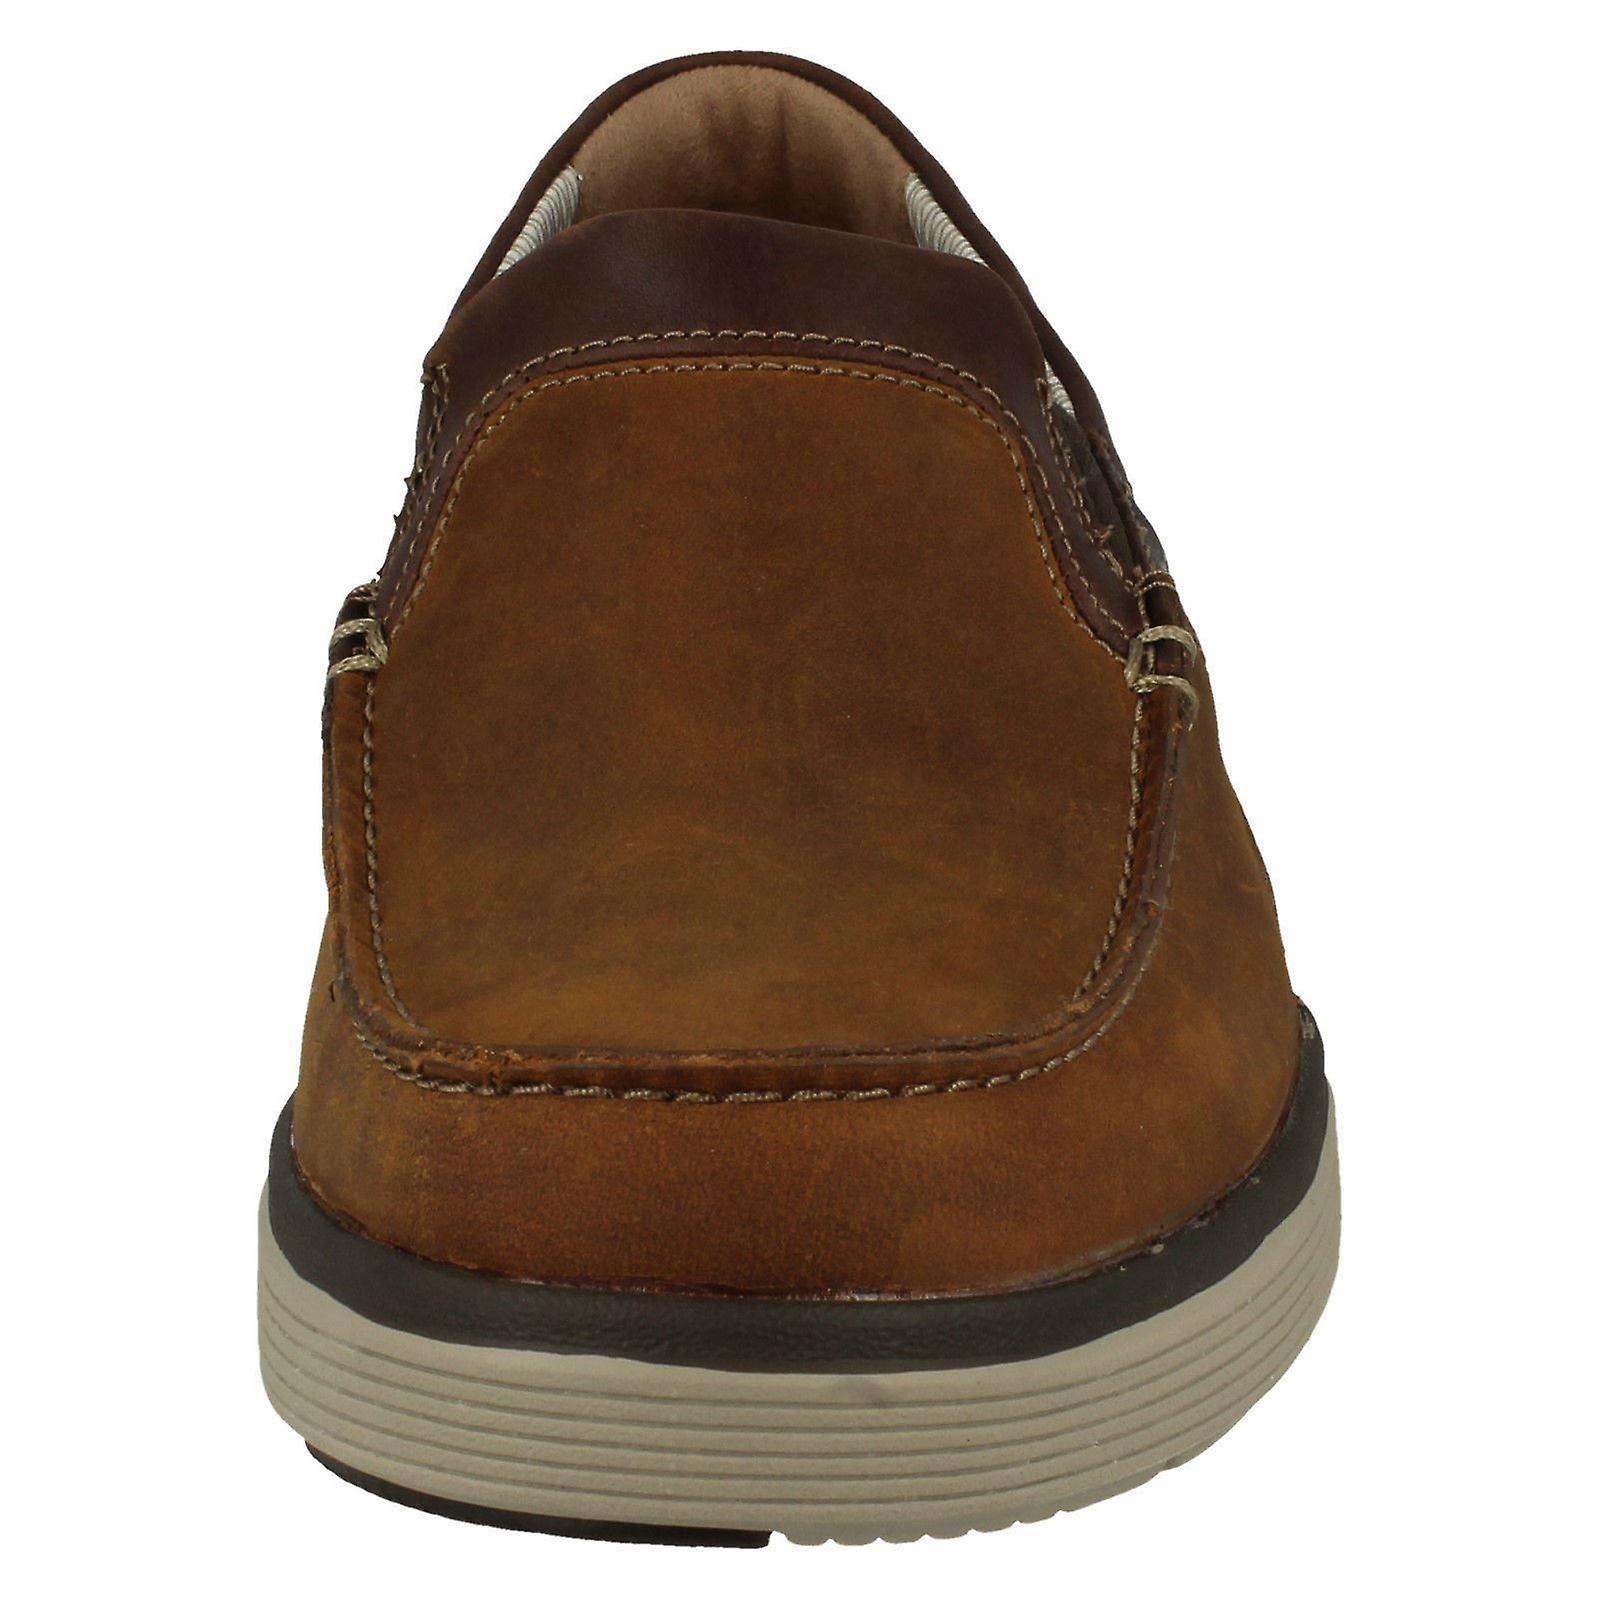 Mens Clarks Casual Slip On Shoes Un Abode Free - Light Tan Leather - UK Size 10G - EU Size 445 - US Size 11M